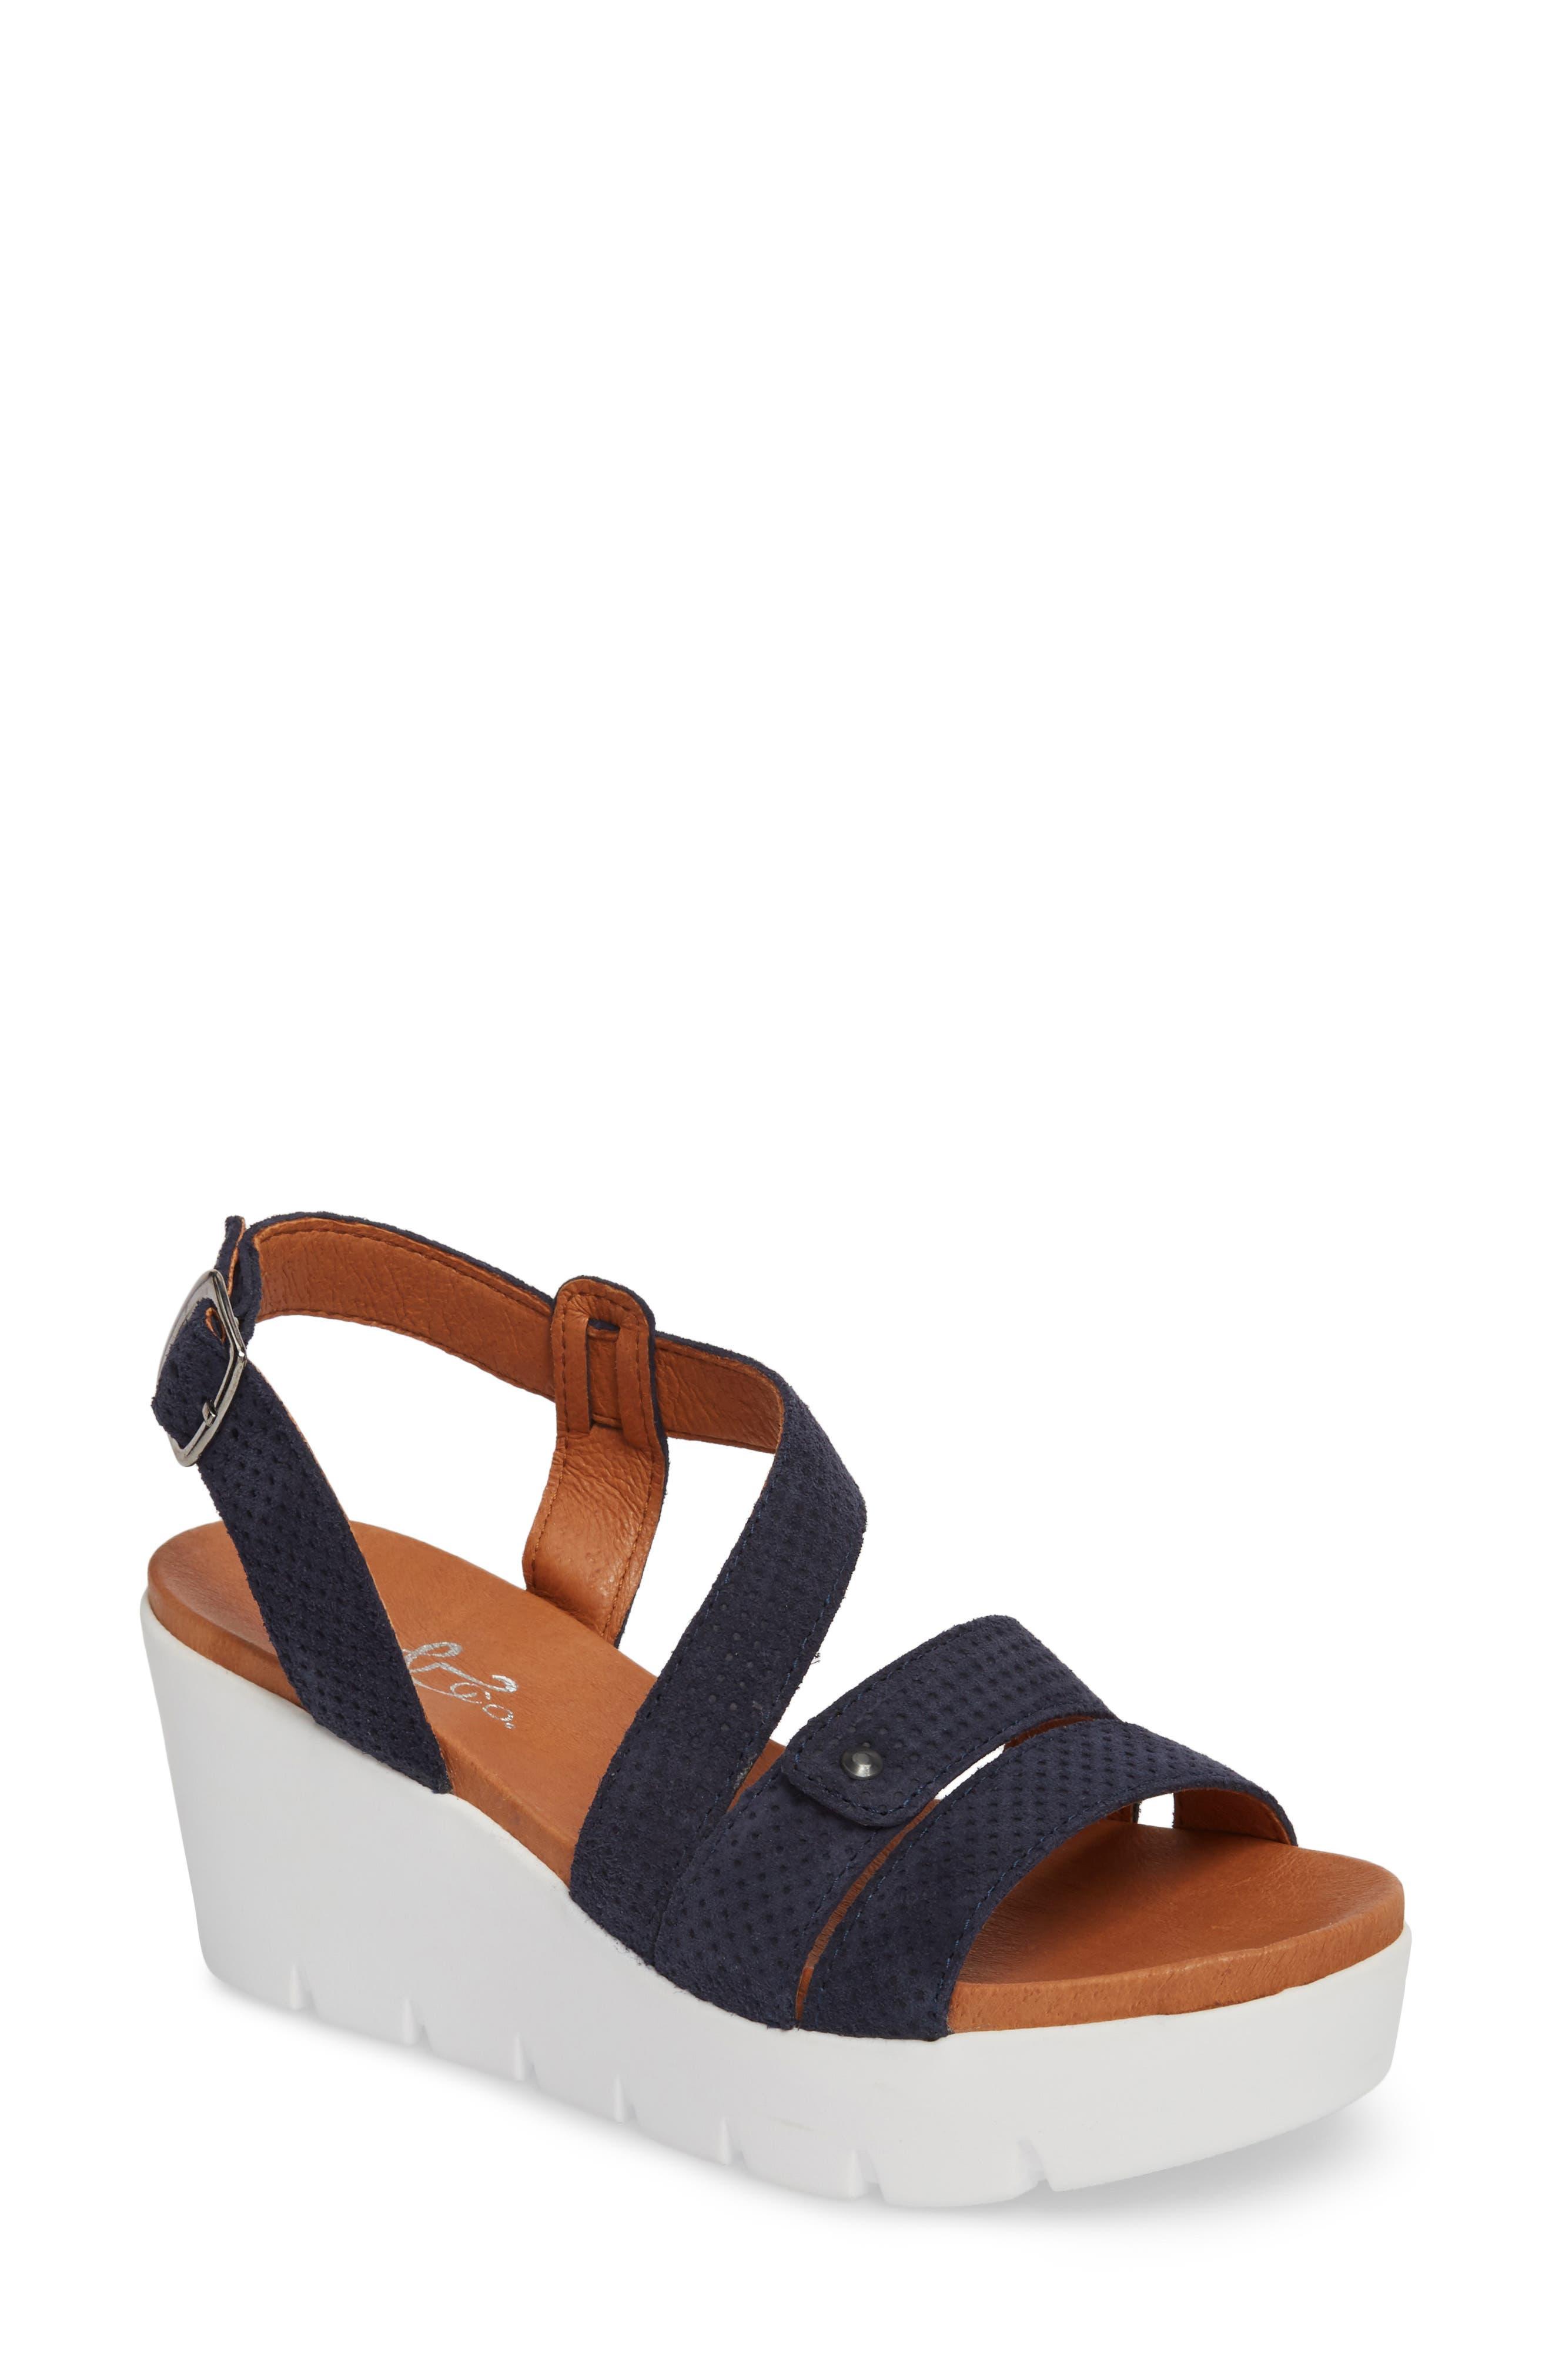 Sierra Platform Wedge Sandal,                             Main thumbnail 1, color,                             Blue Leather